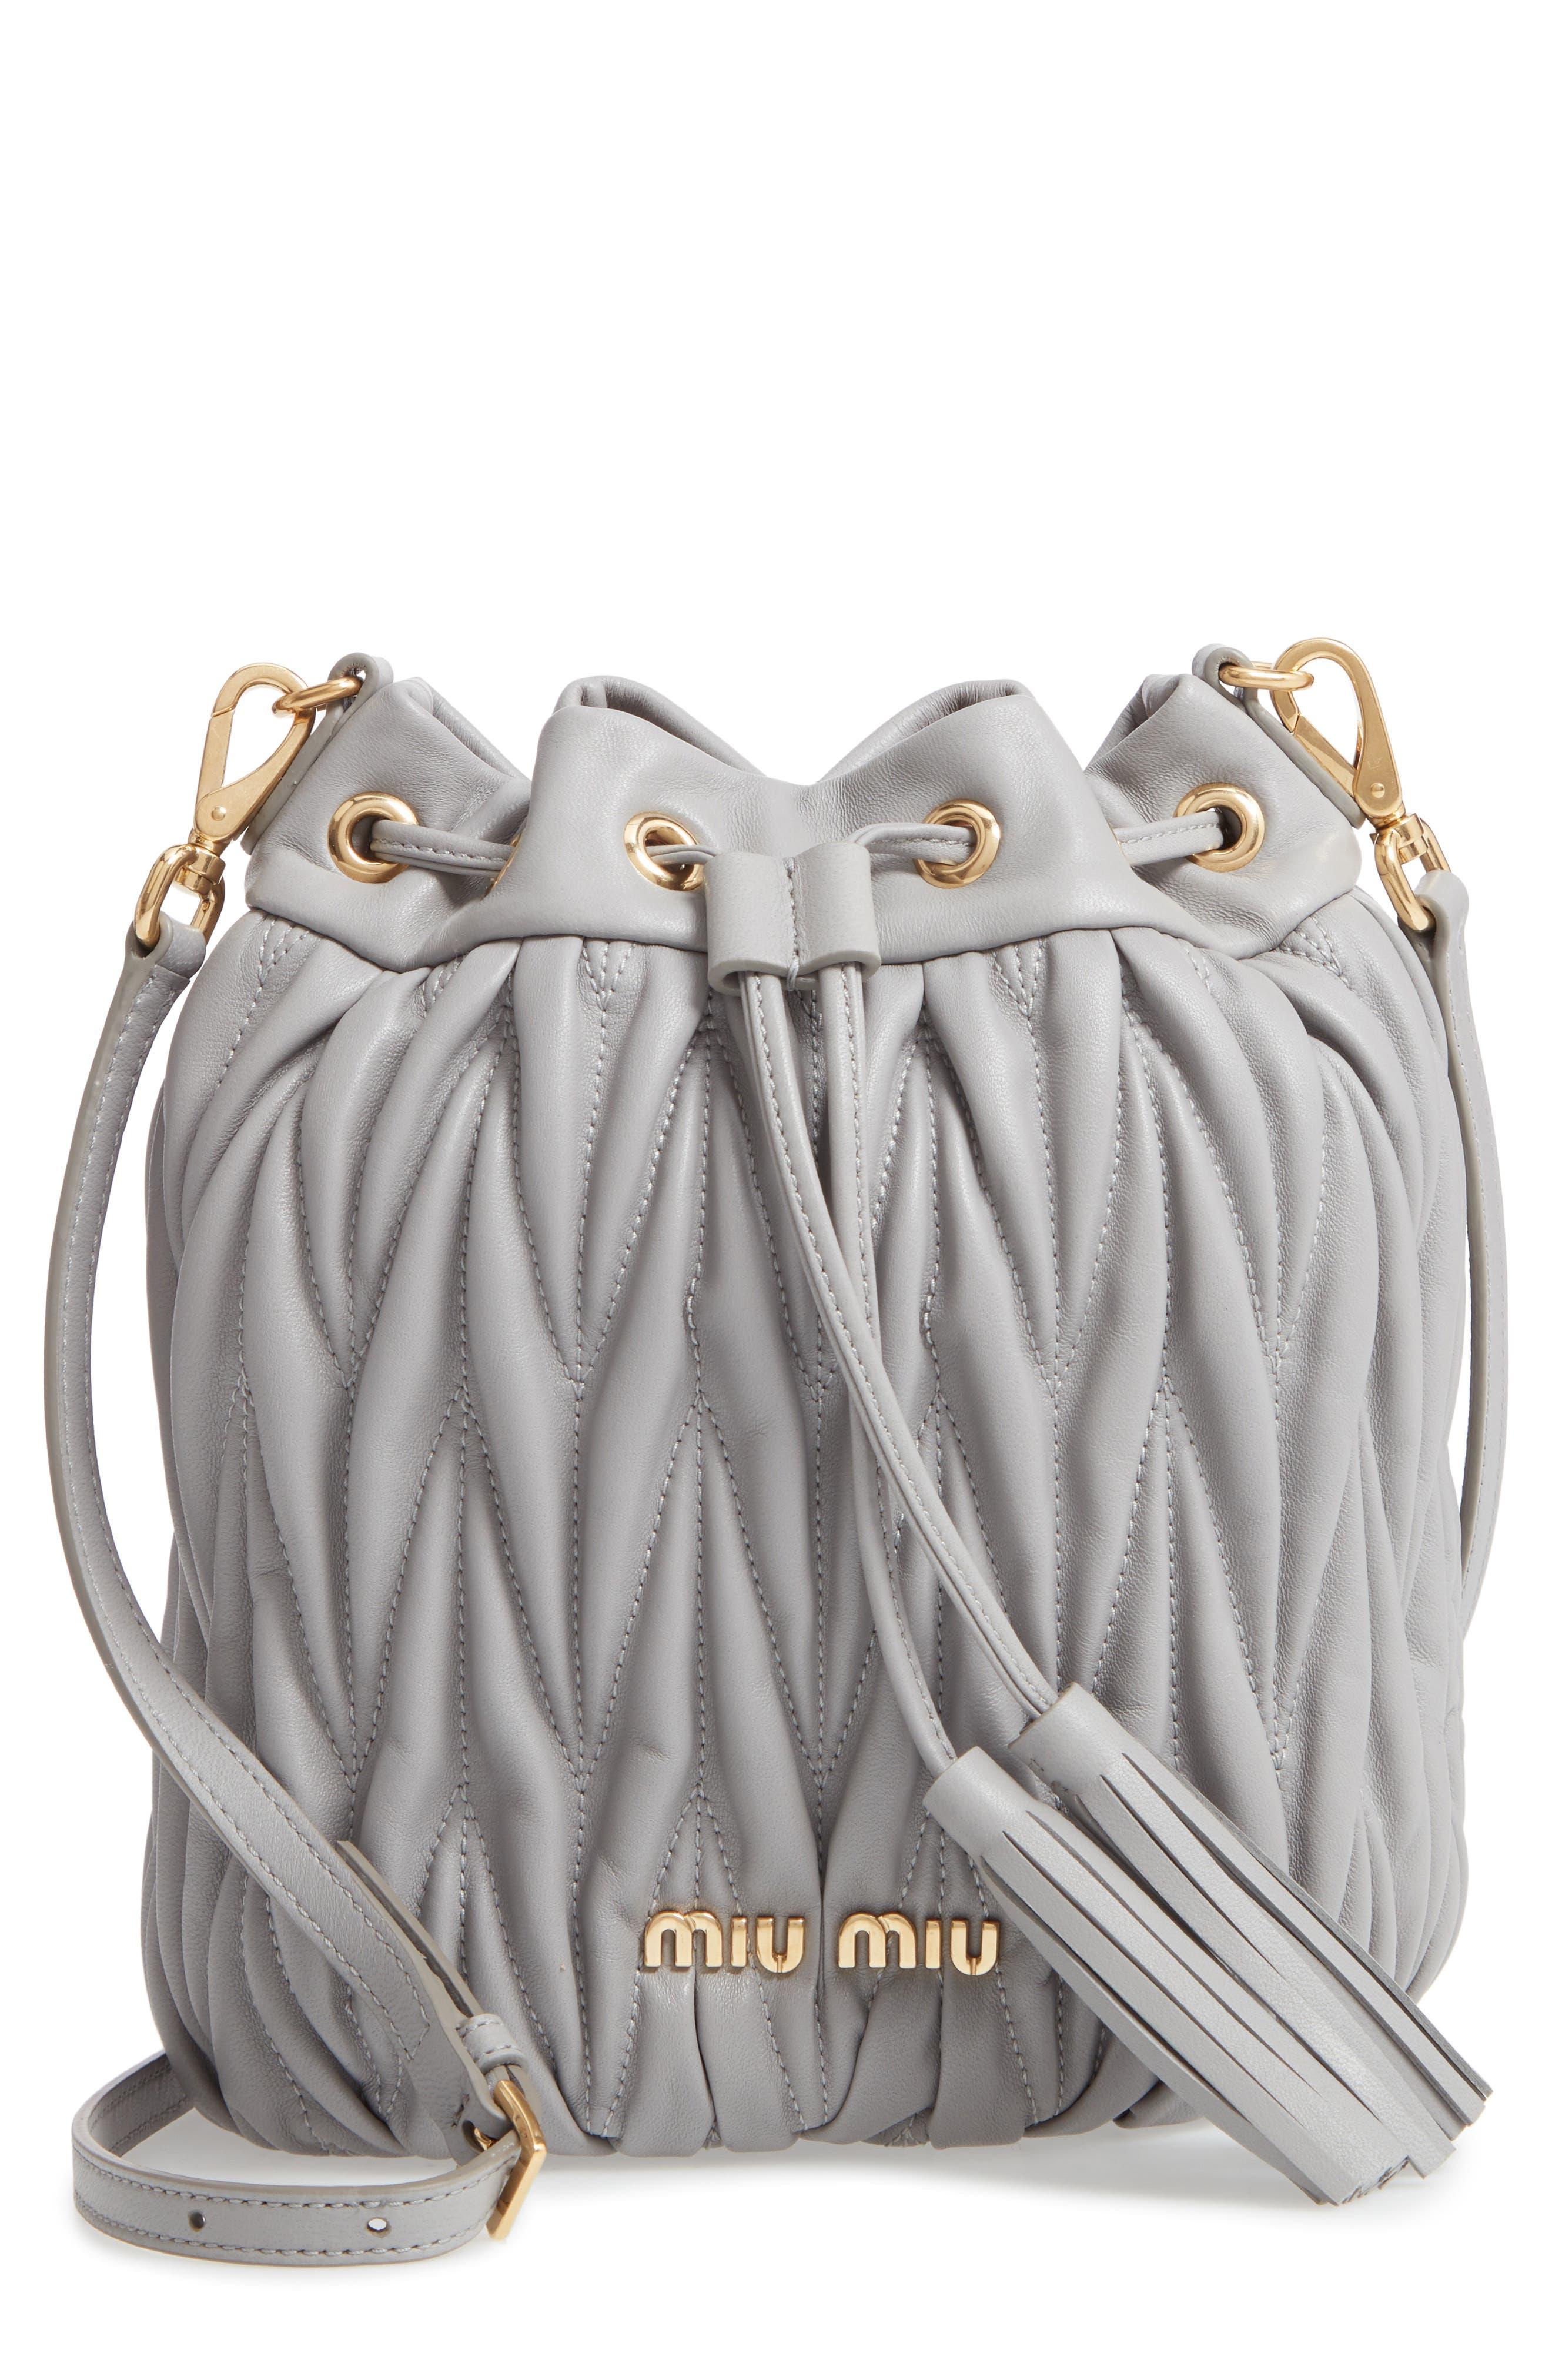 MIU MIU Matelasse Lambskin Leather Bucket Bag - Grey in Nube